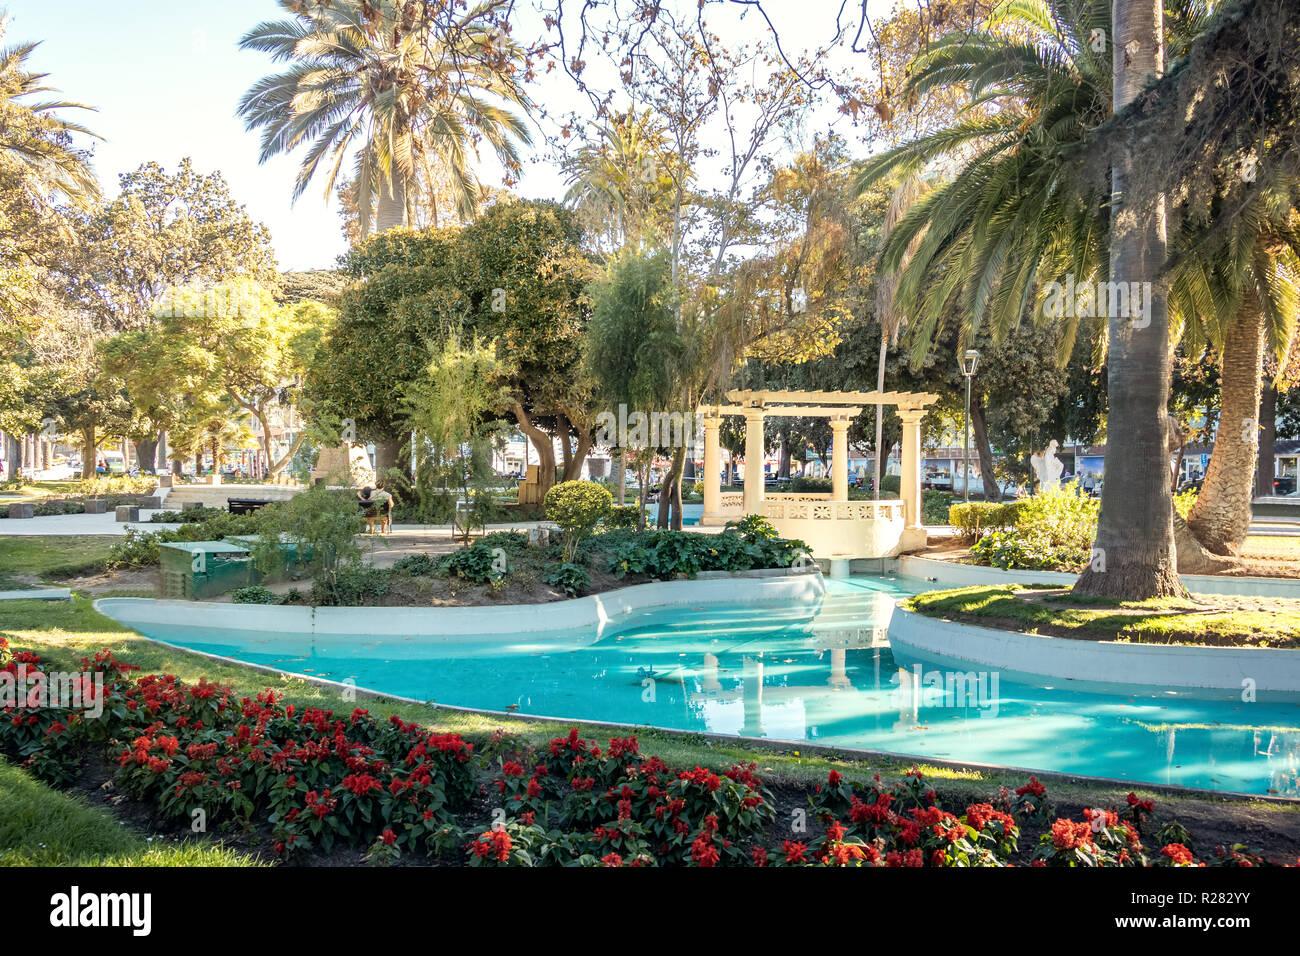 Plaza Vergara - Vina del Mar, Chile - Stock Image